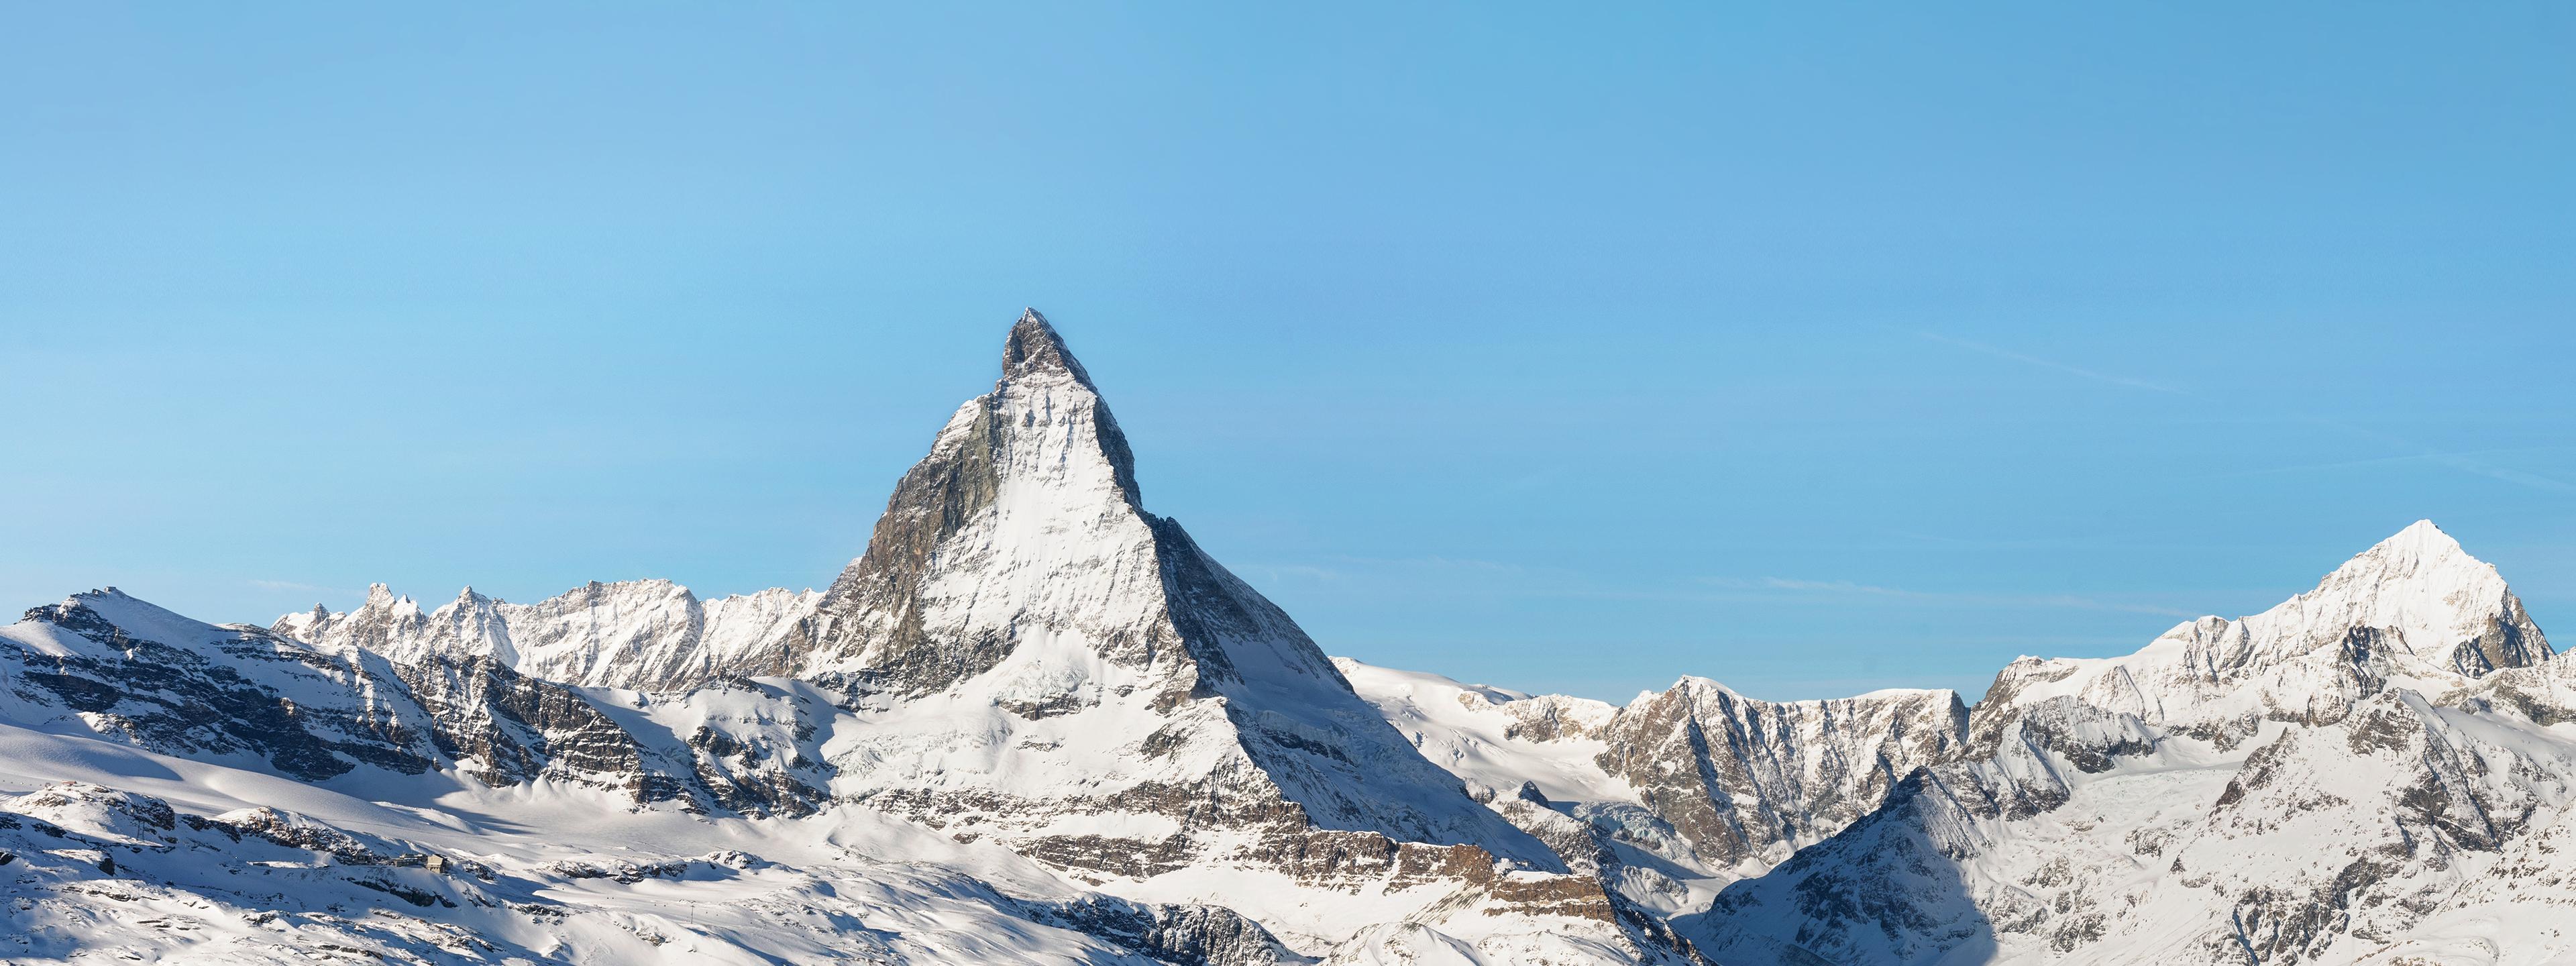 BRITA 願景 白雪皚皚的山頂